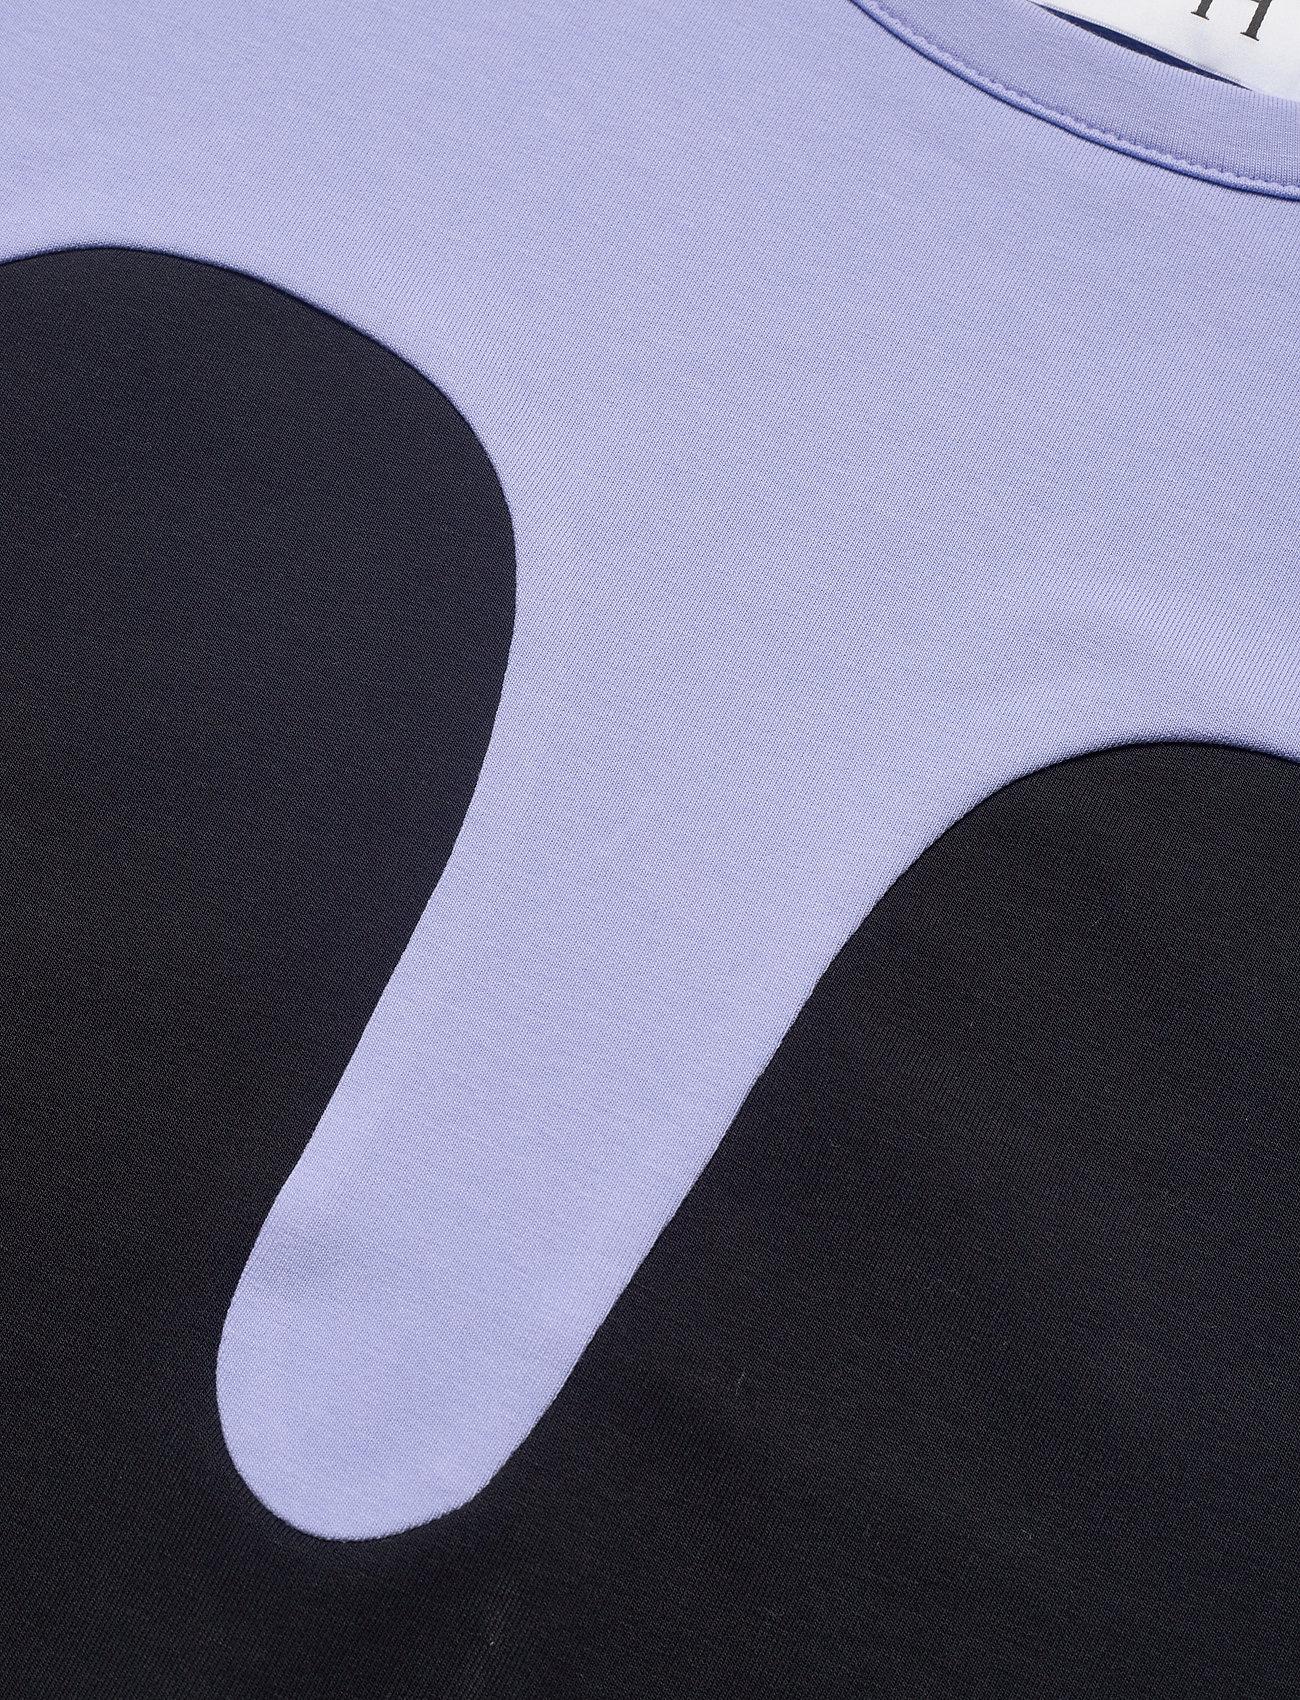 R/H Studio - R/H STUDIO x BOOZT Magic Sweater - sweatshirts & hoodies - lavendel / black - 2